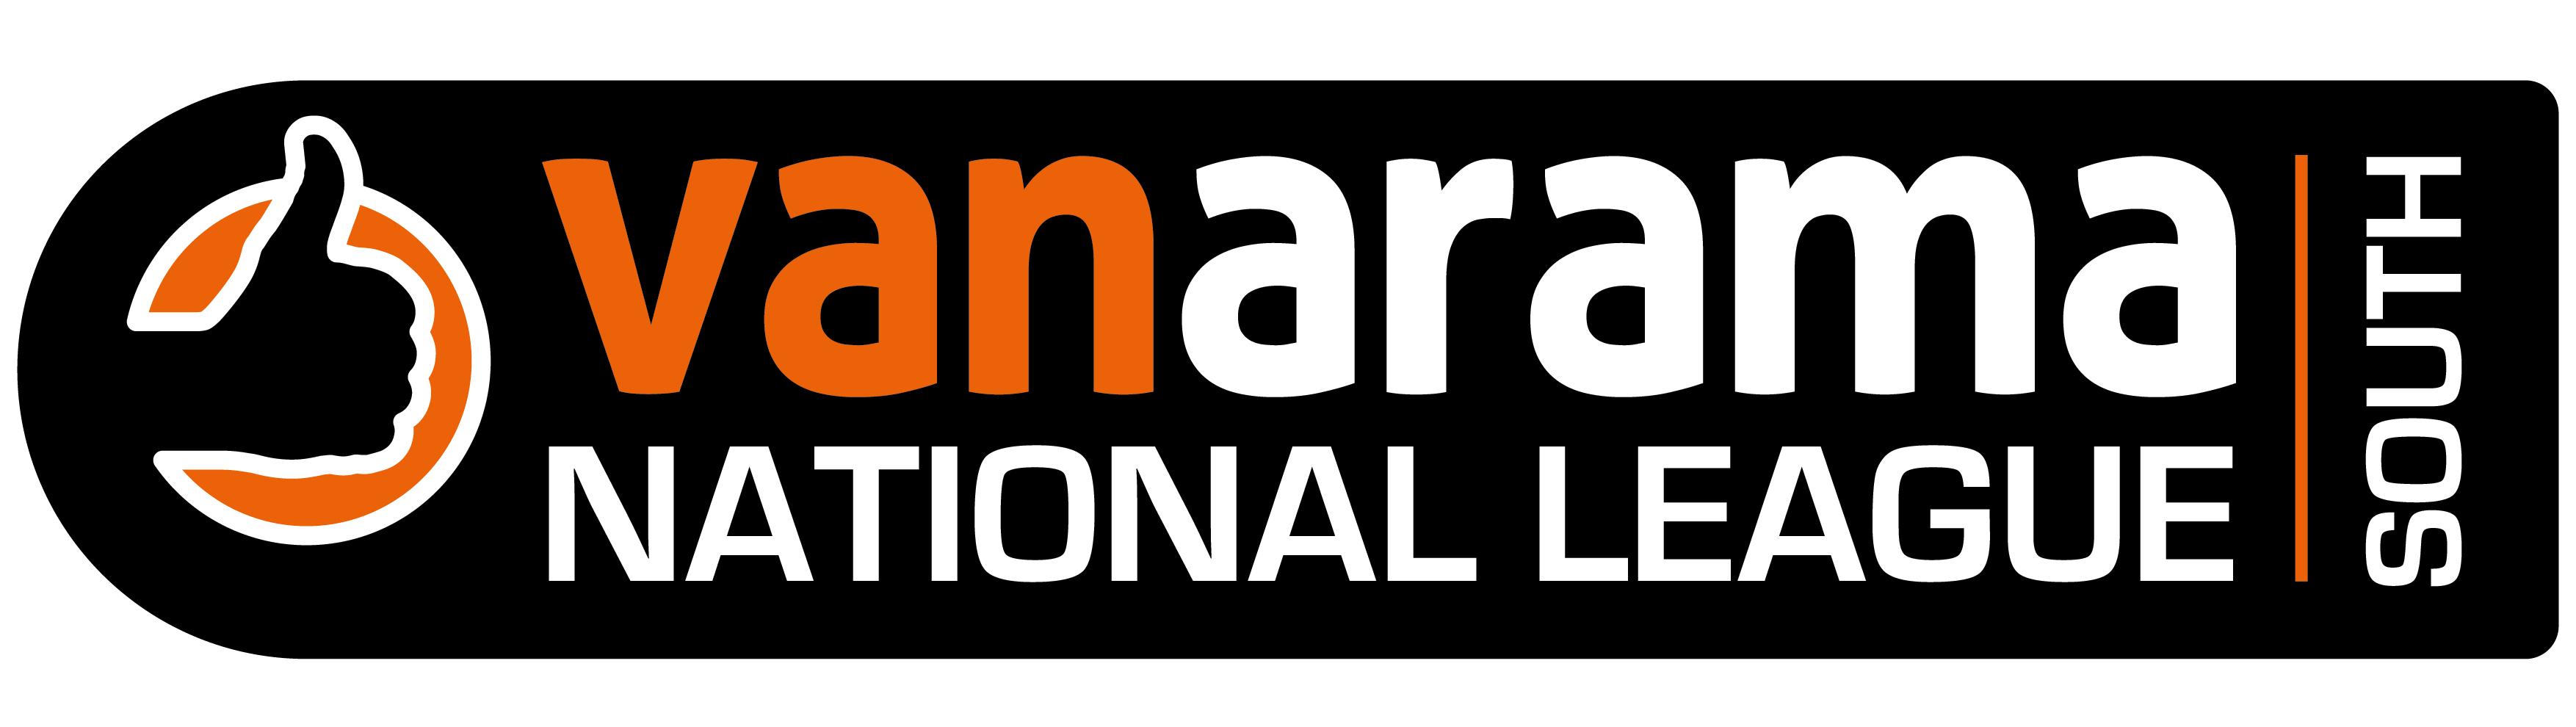 Vanarama National League South